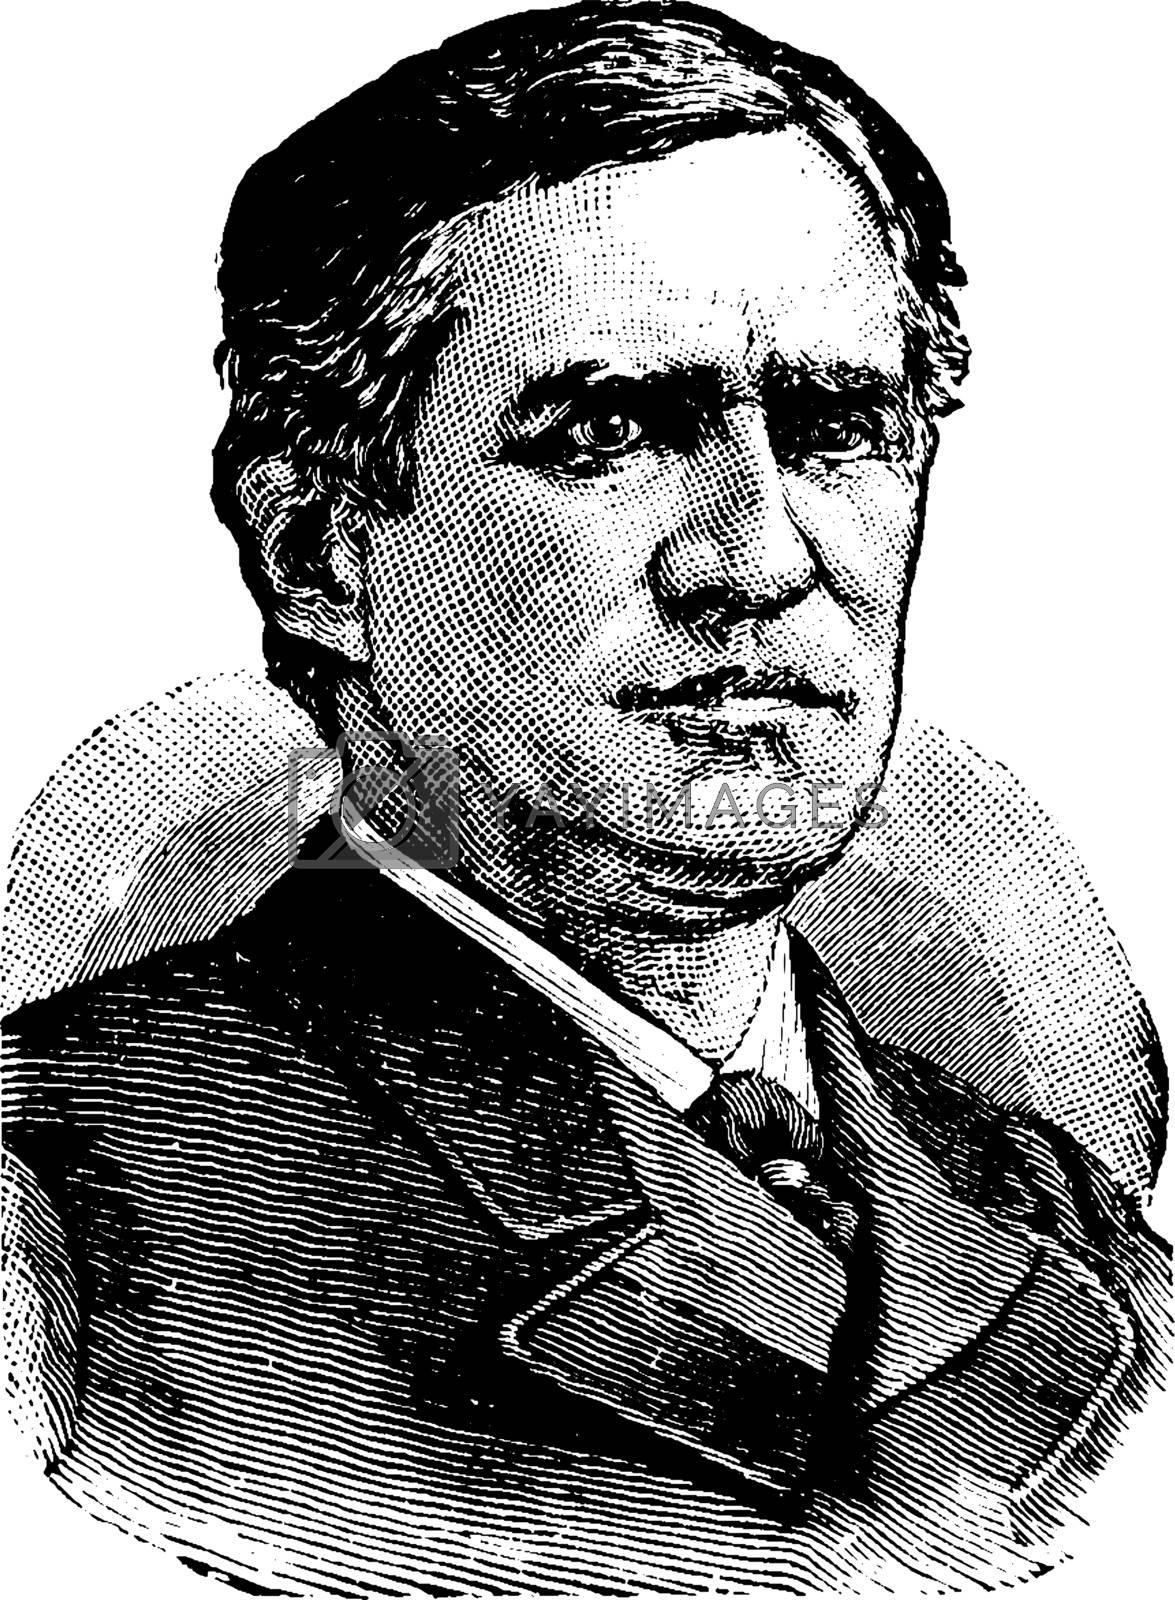 Thomas F. Bayard, vintage illustration by Morphart